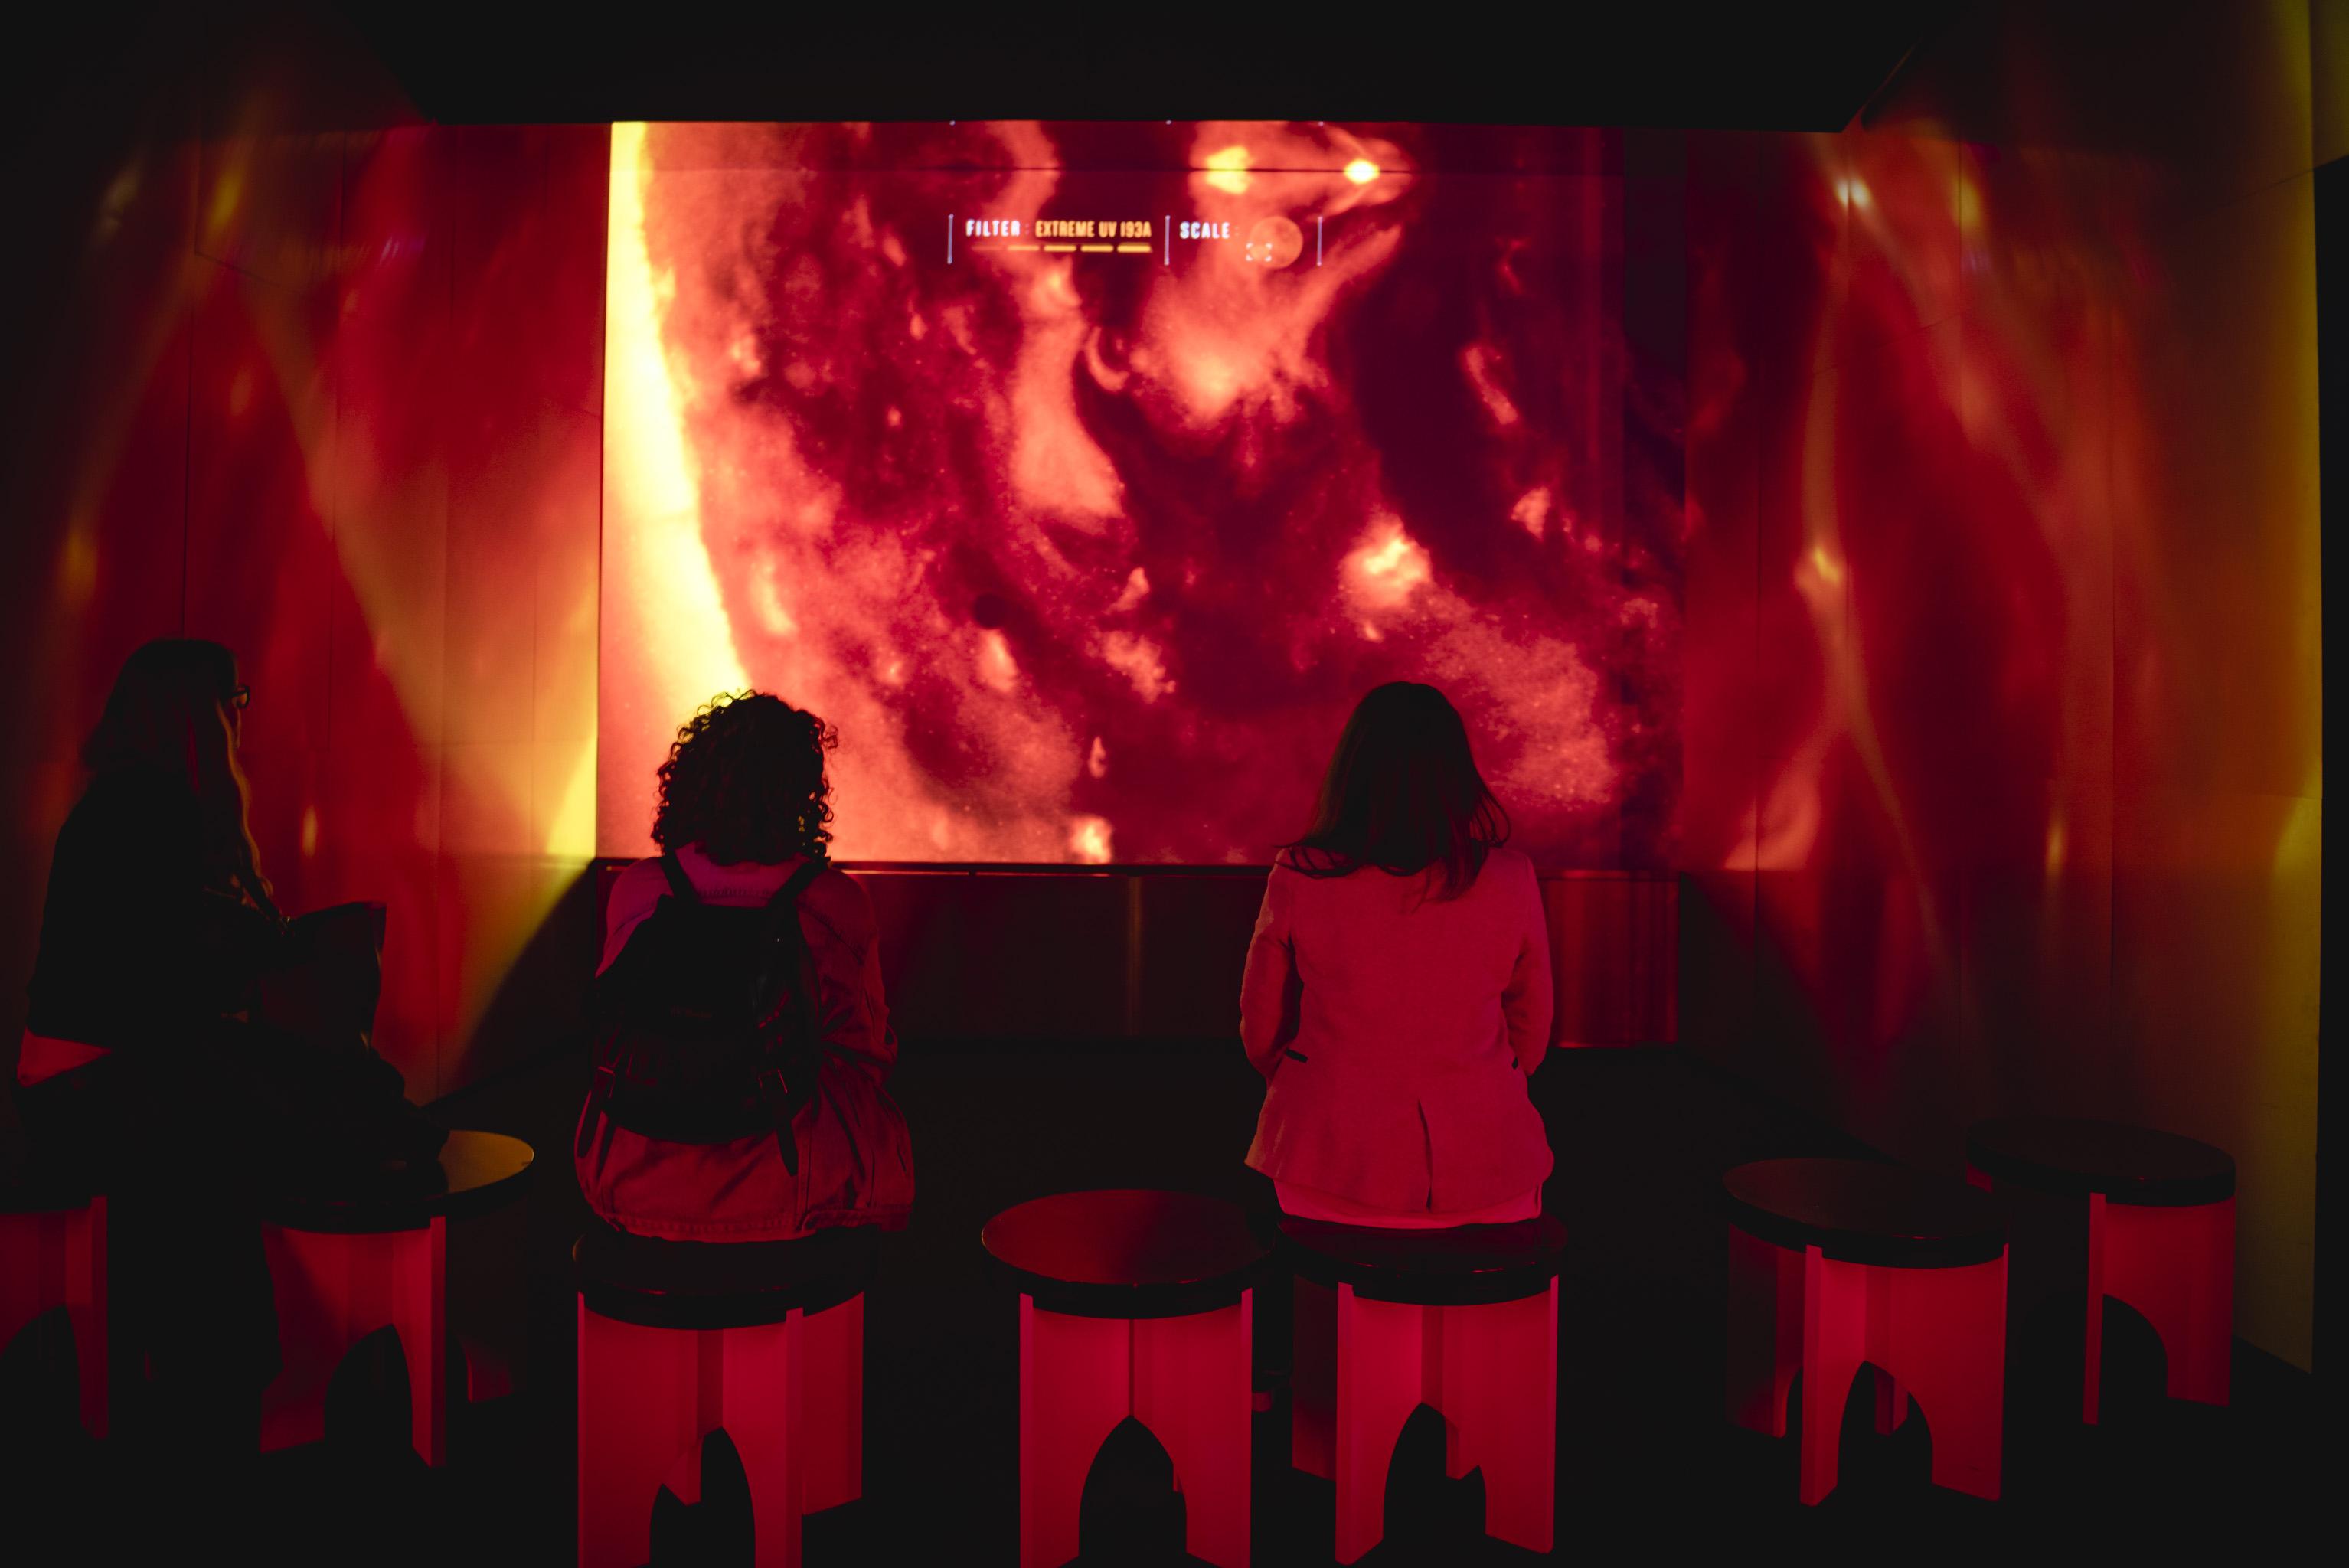 Half term fun - People sat on stools watching film footage the sun